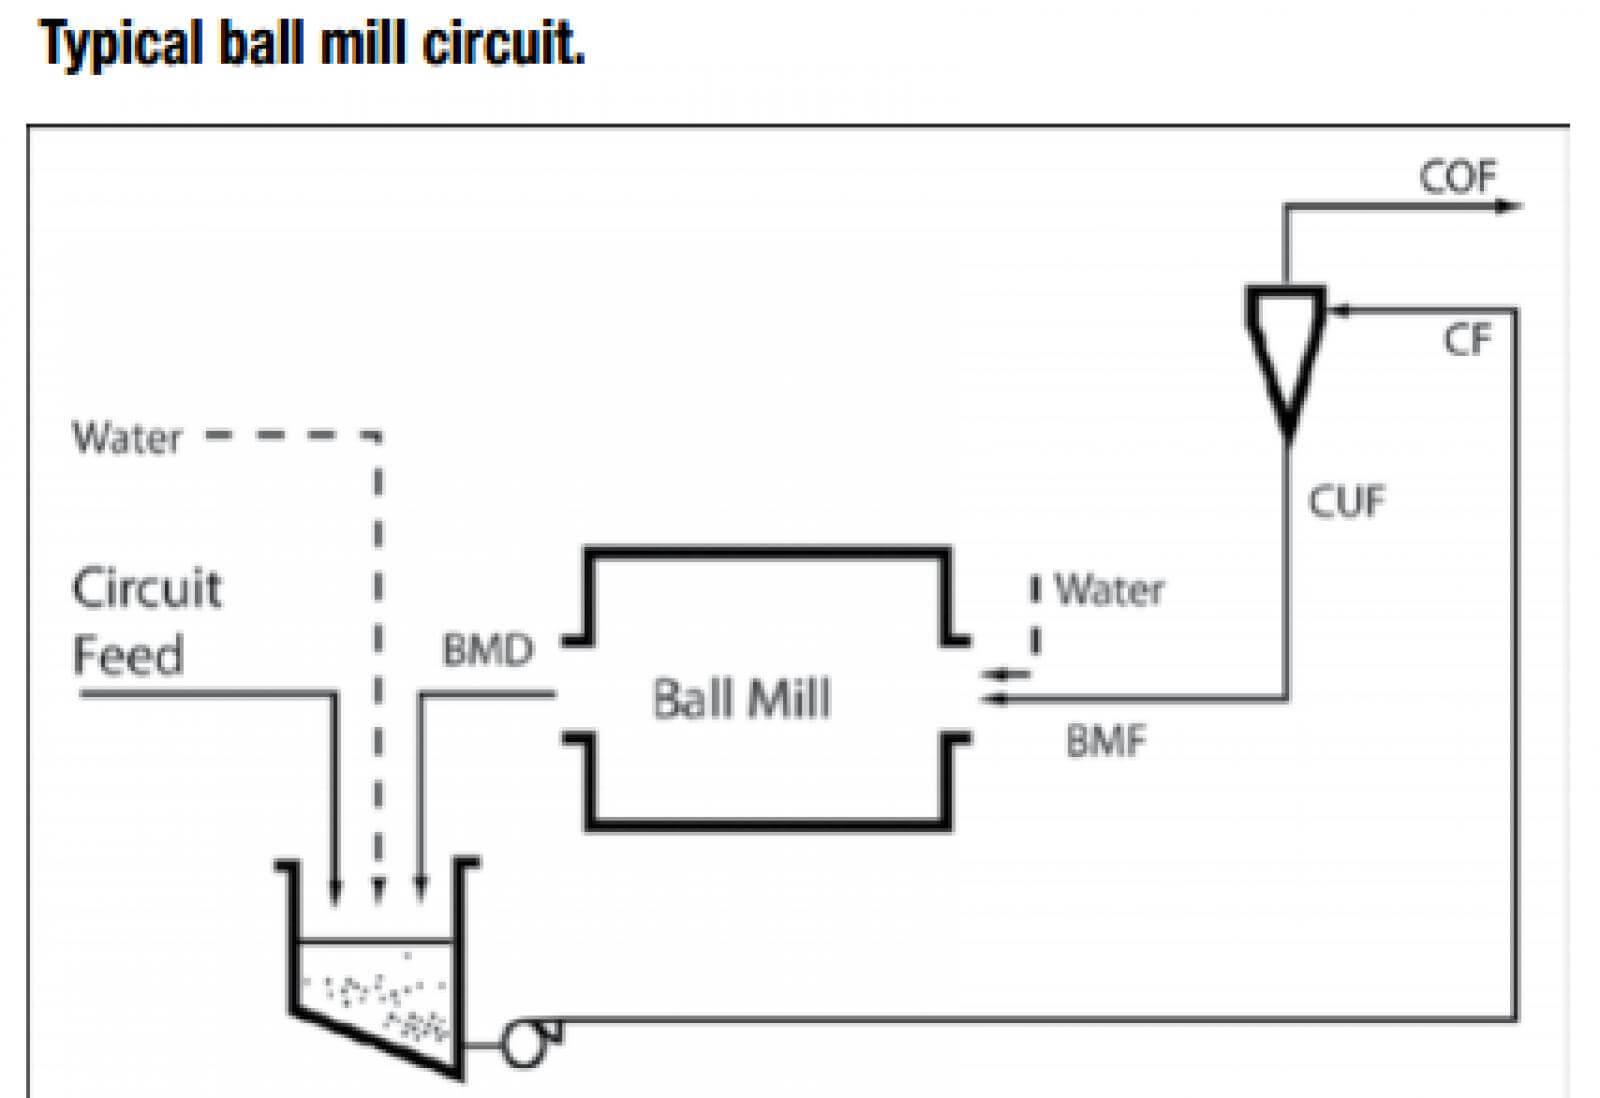 high recirculating loads in ball mill circuits